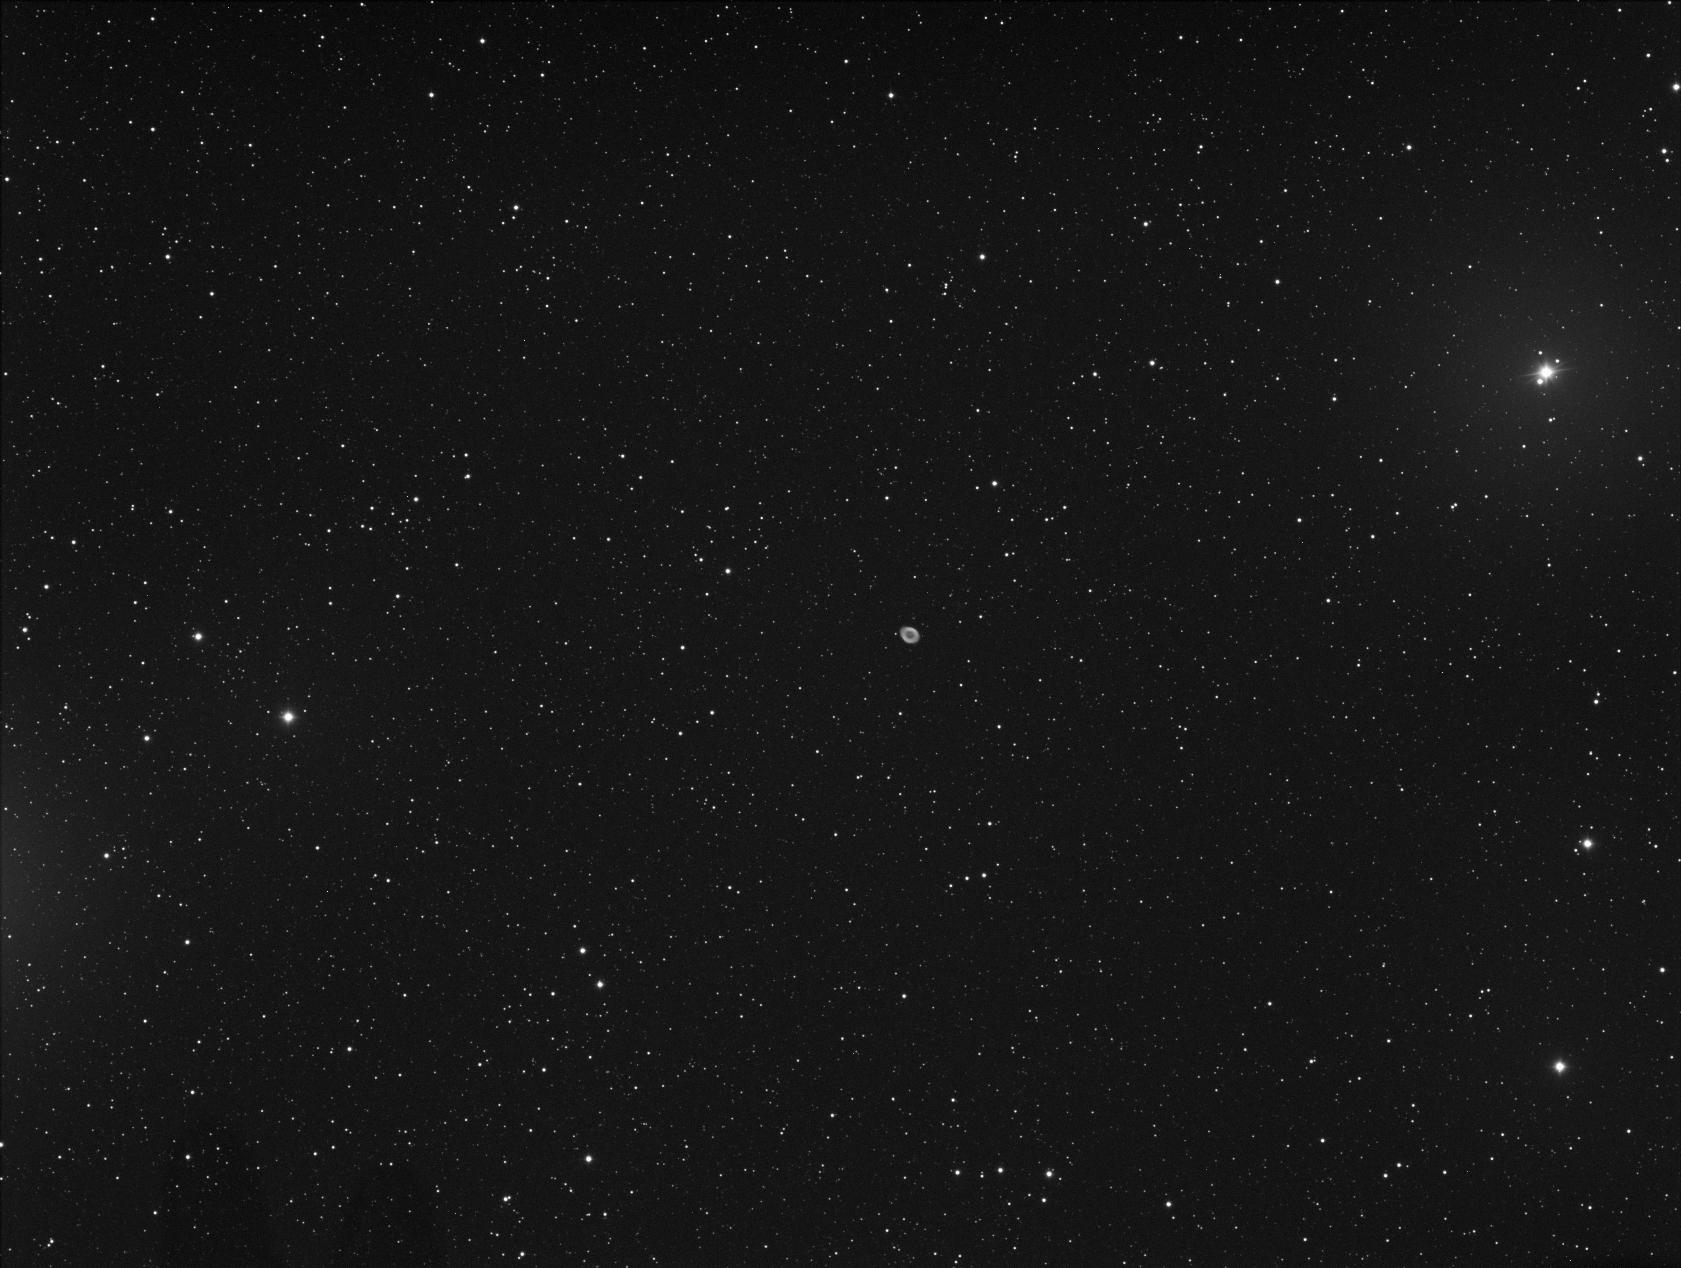 140928 M57_60S_DBE - Pose unitaire Atik 383L+ sur FSQ106